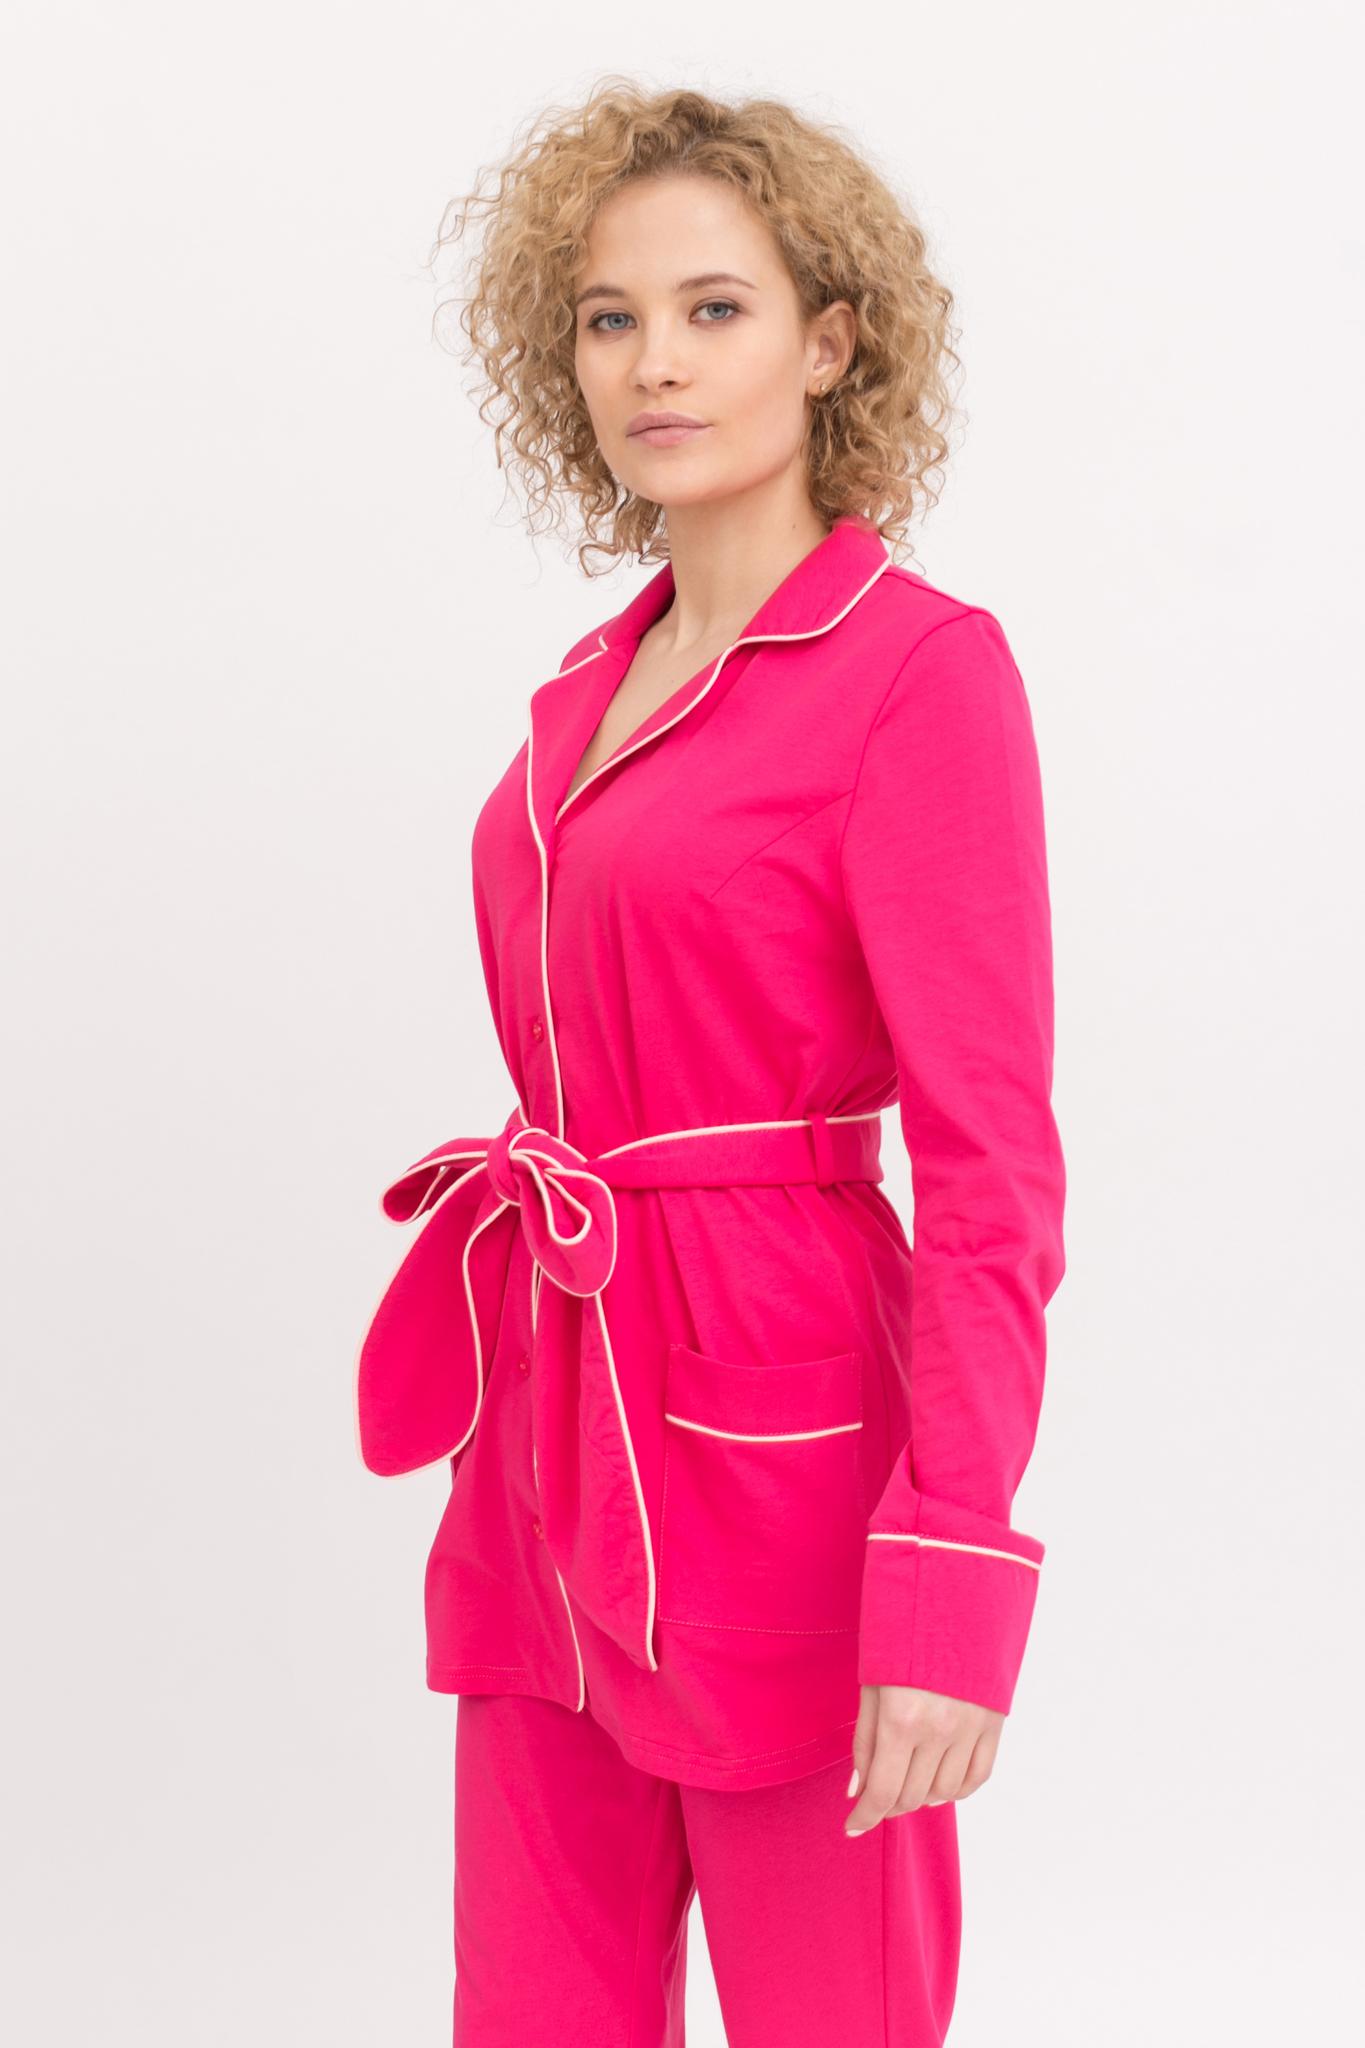 7e32a27b46b83f3 Пижама женская с брюками и длинным рукавом цвета Фуксия с поясом I ...